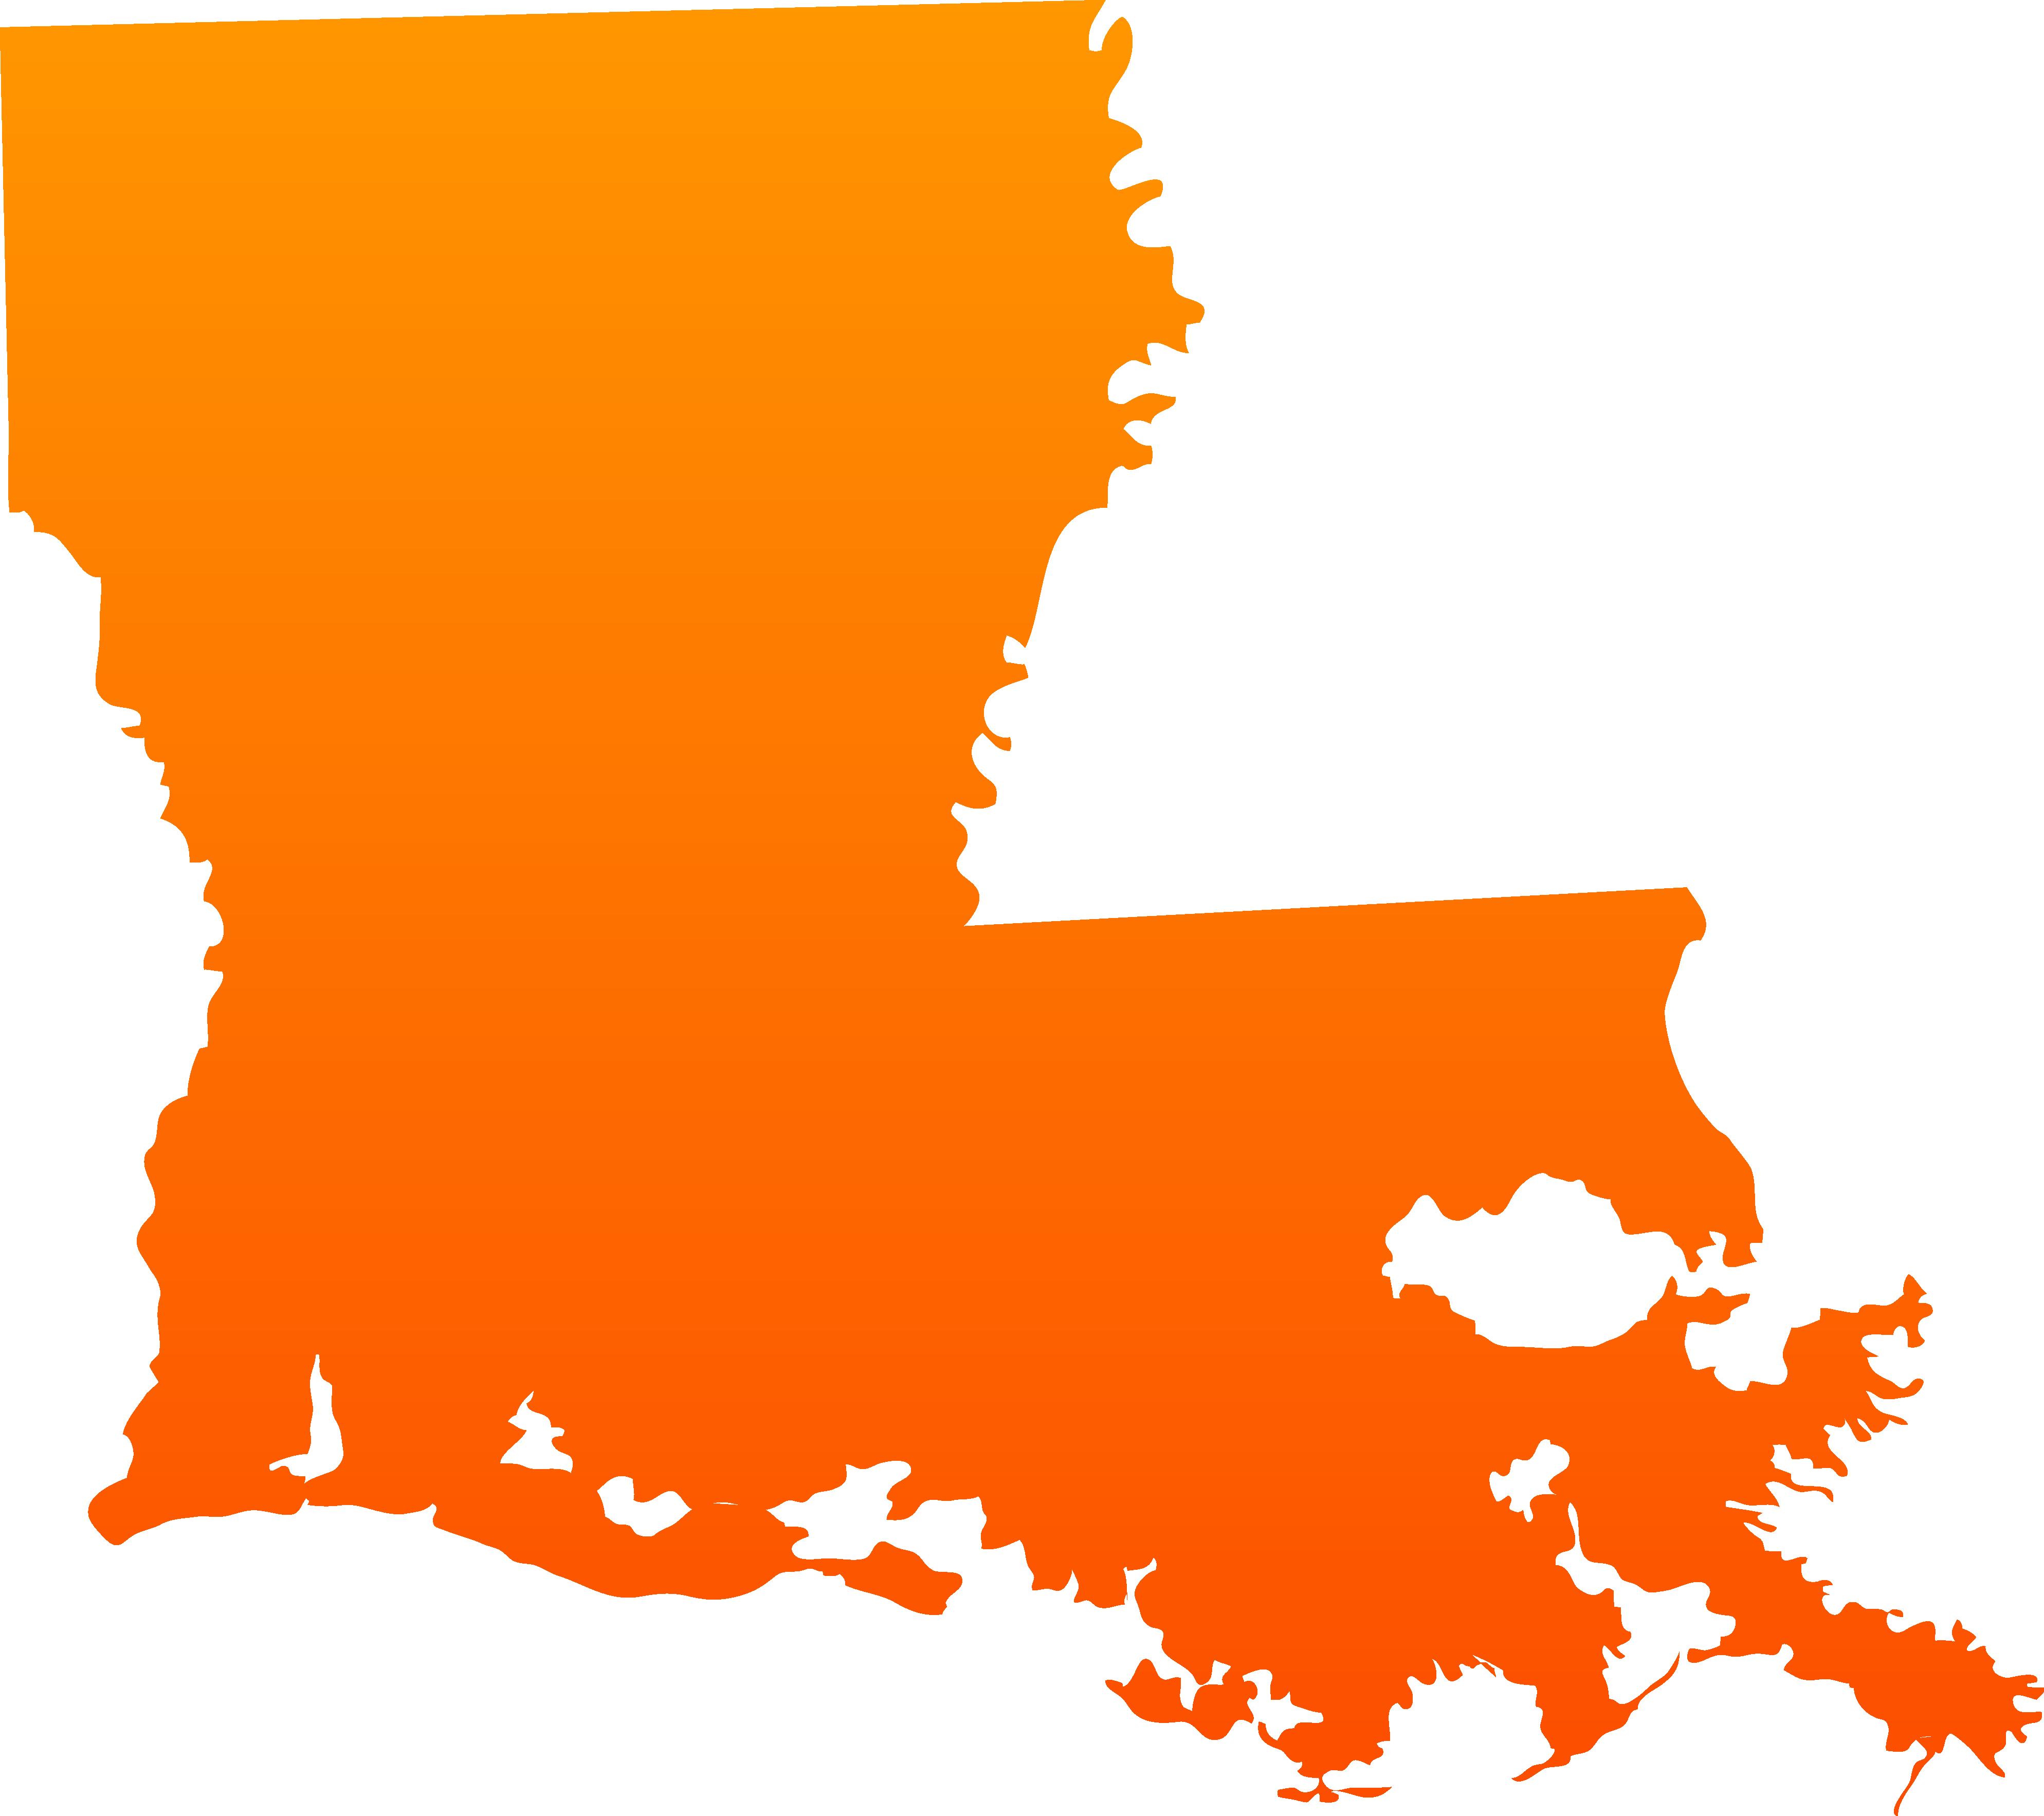 Design clipart orange. Louisiana clip art free